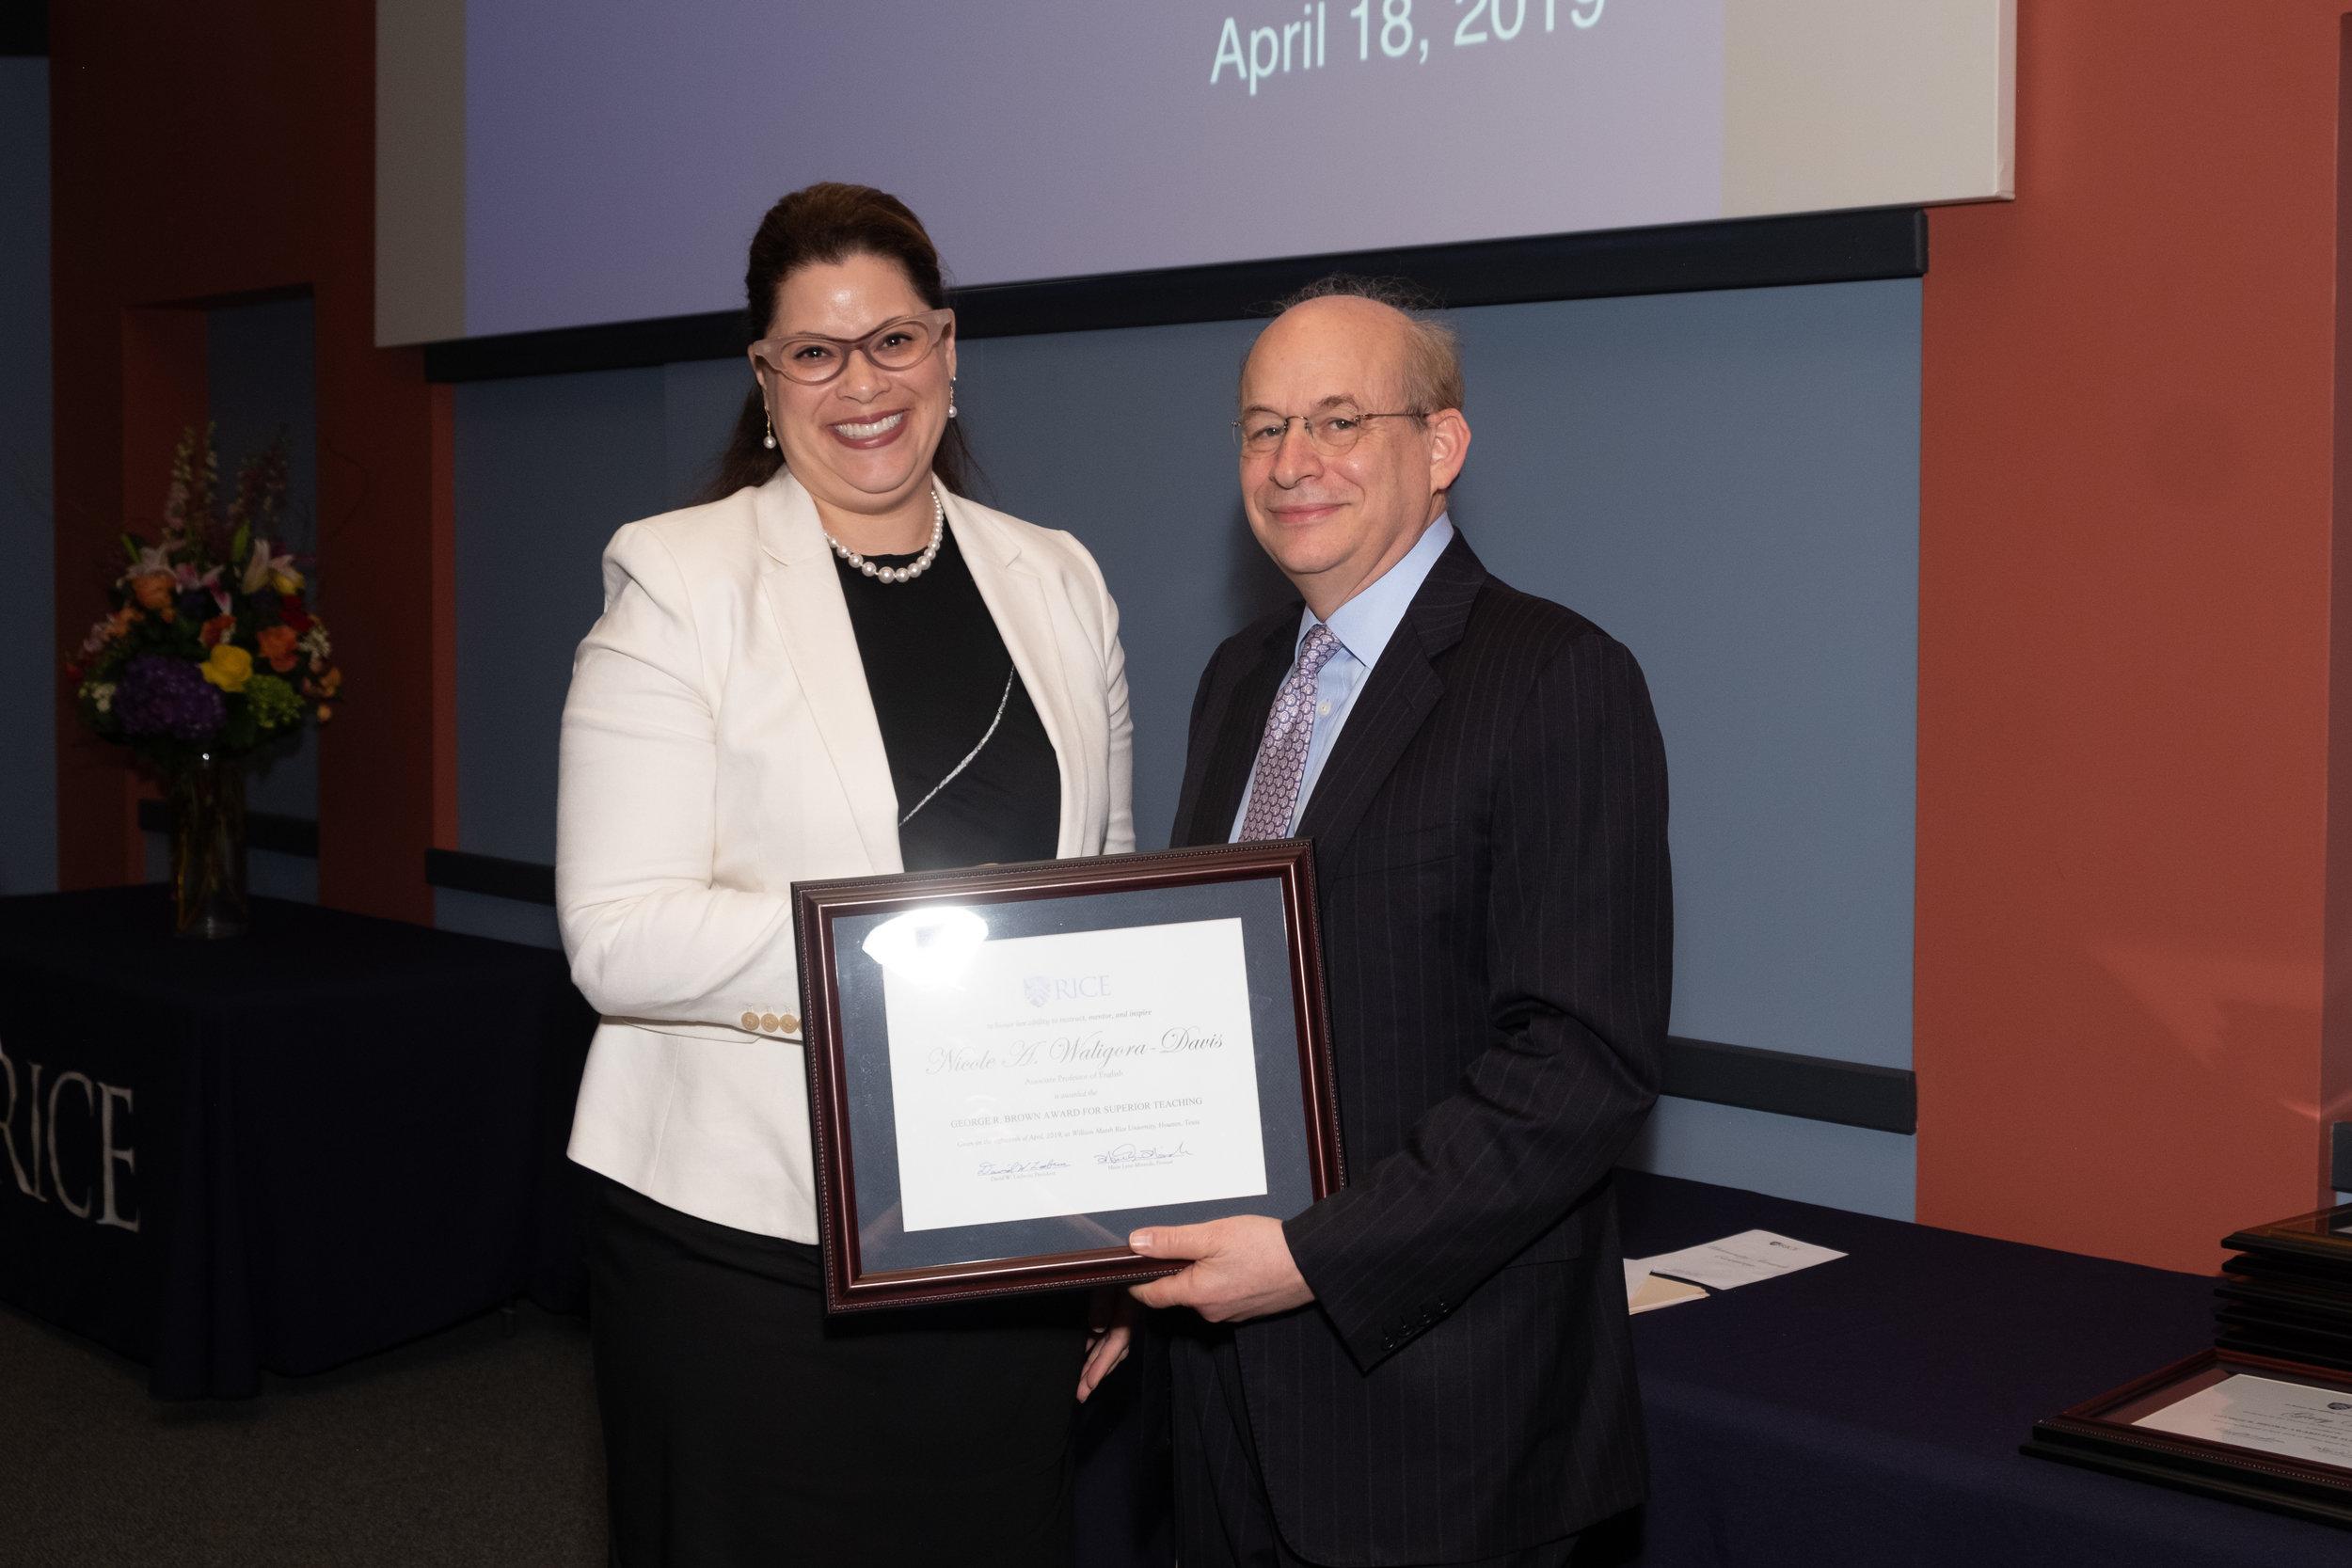 President Leebron & Nicole Waligora-Davis, George R. Brown Award for Superior Teaching